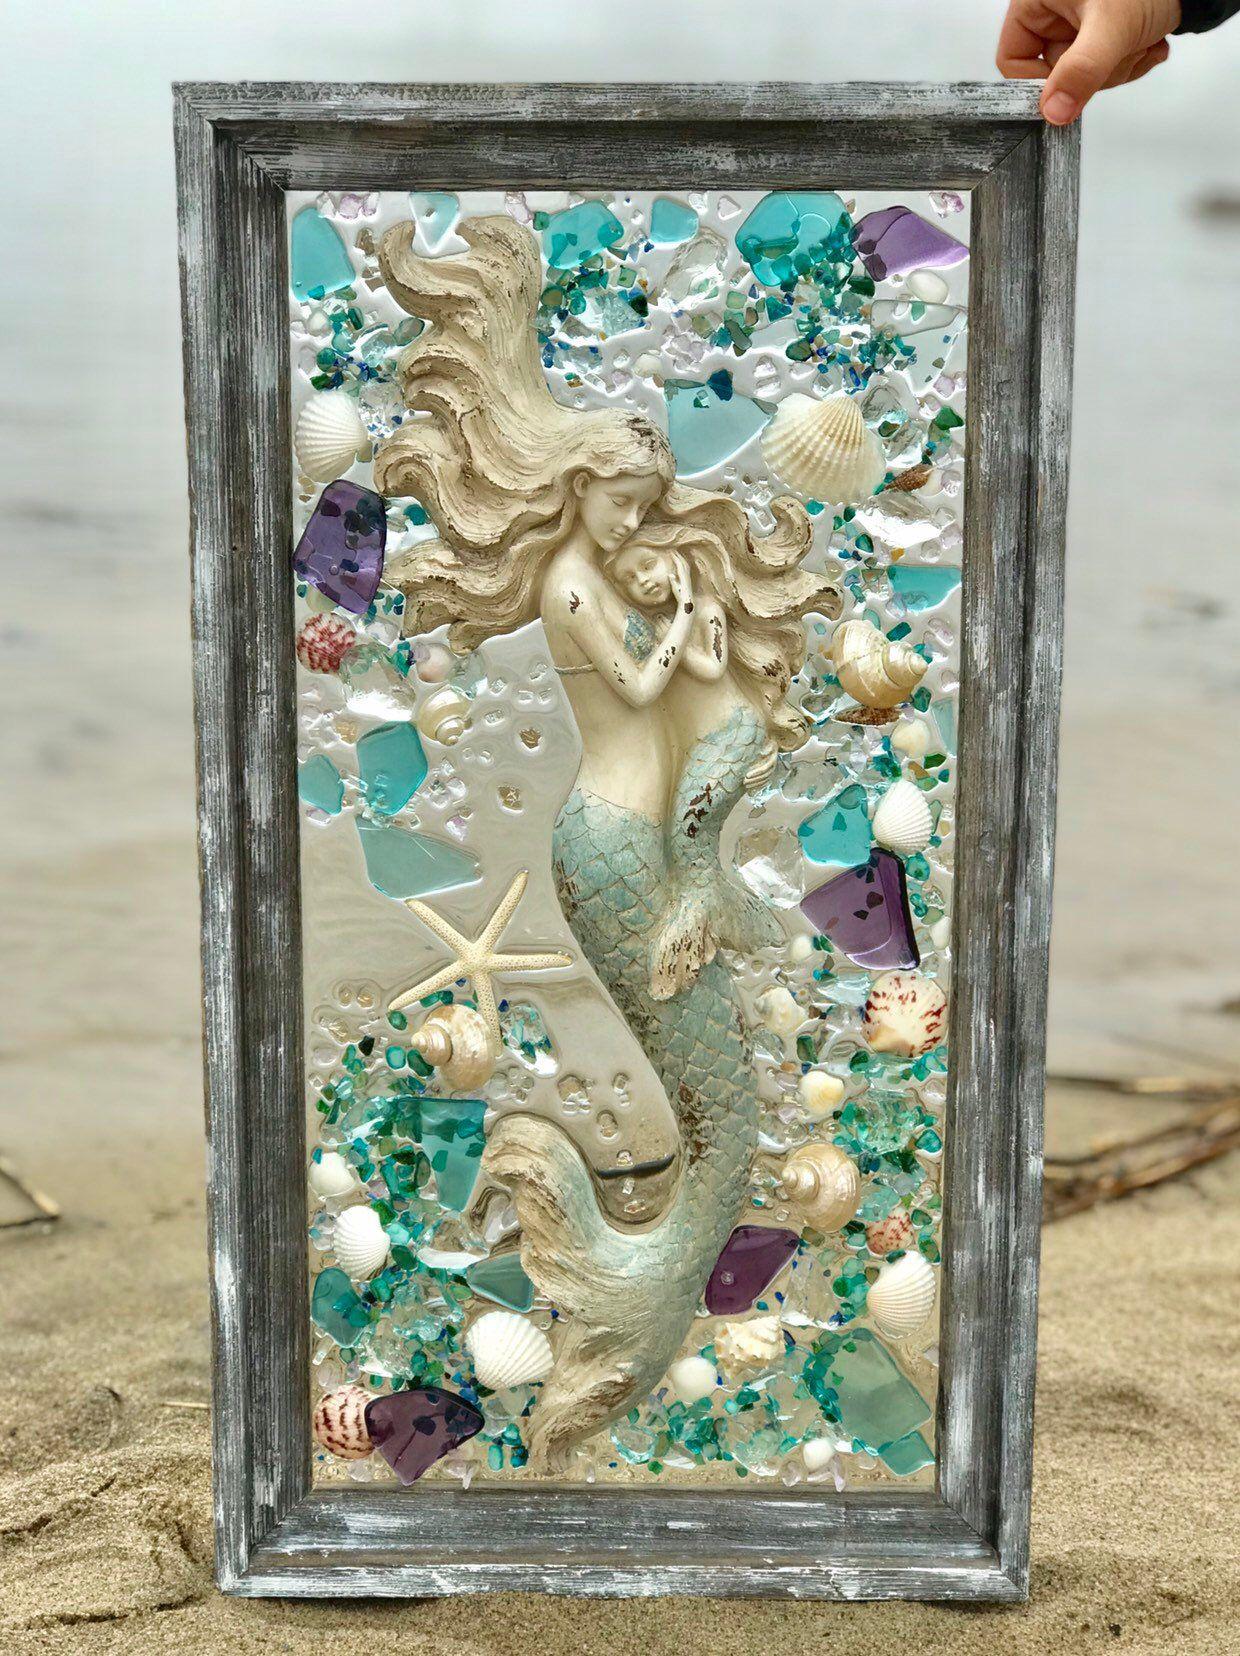 Large beach glass shells and mermaid in barnwood frame